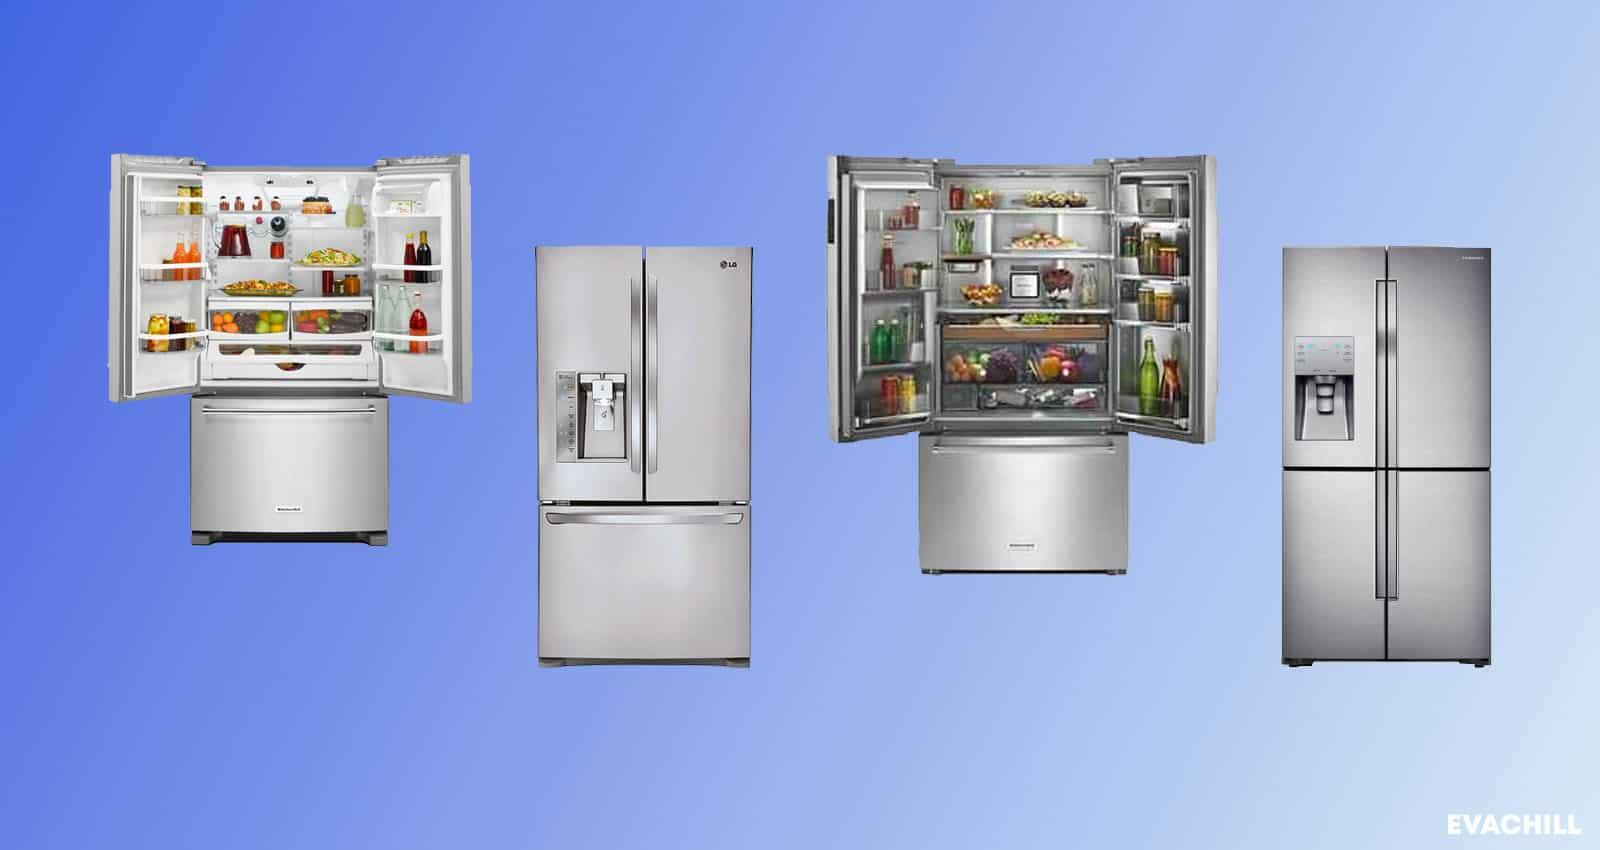 Best Counter Depth Refrigerator 2020.15 Best Counter Depth Refrigerators For Your Kitchen 2019